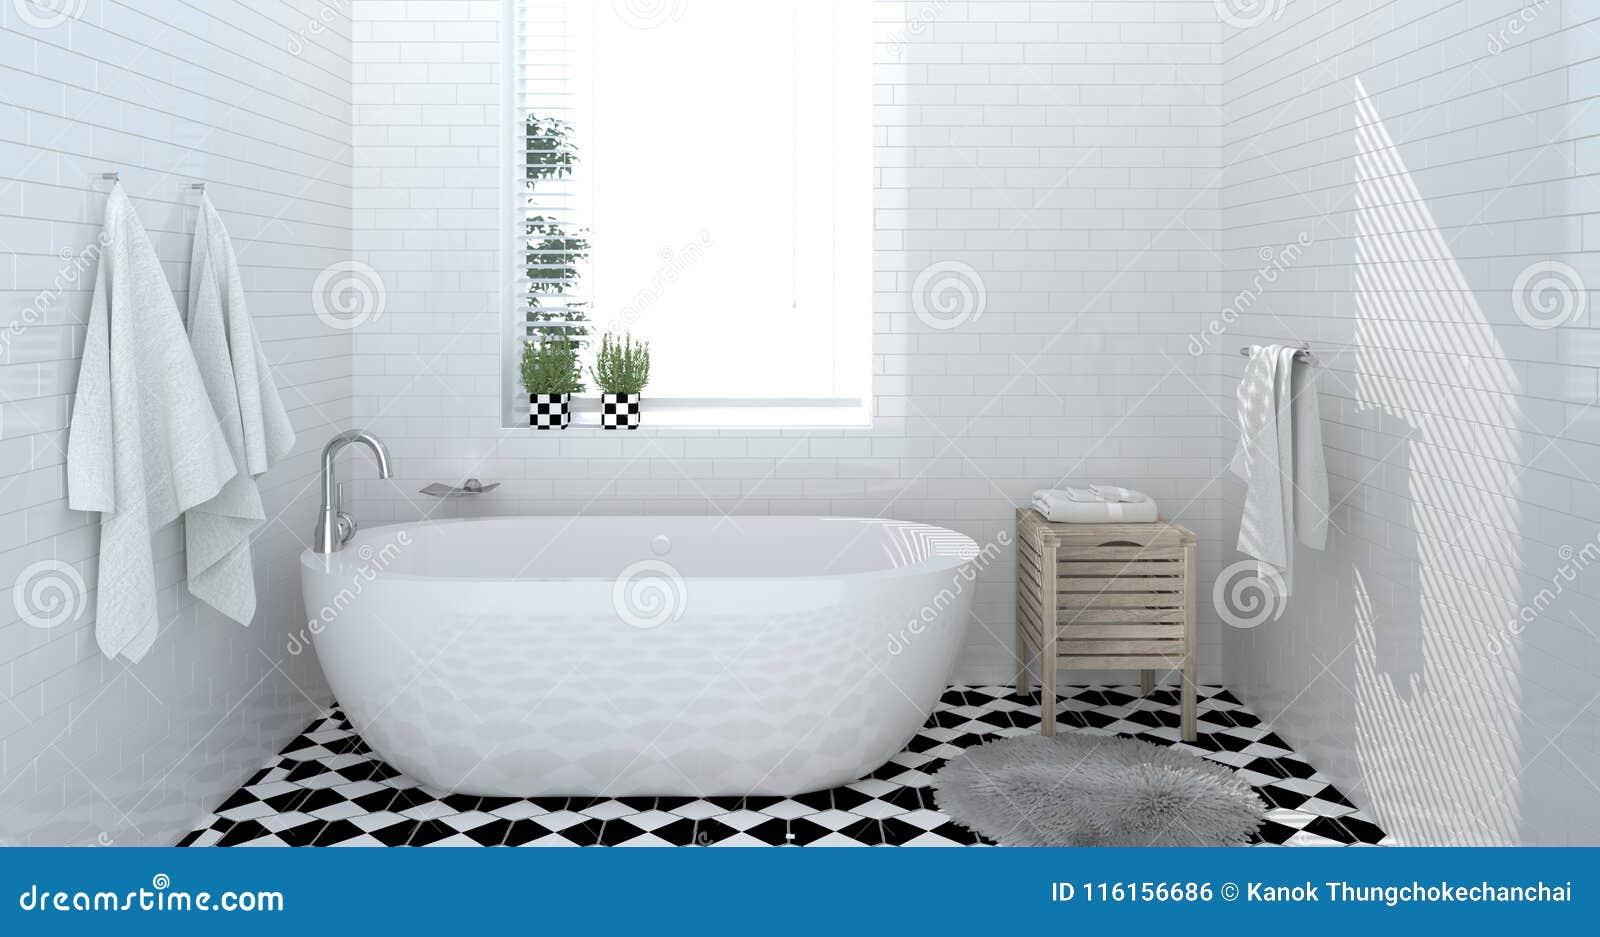 Bathroom interior,toilet,shower,modern home design 3d rendering for copy space background white tile bathroom